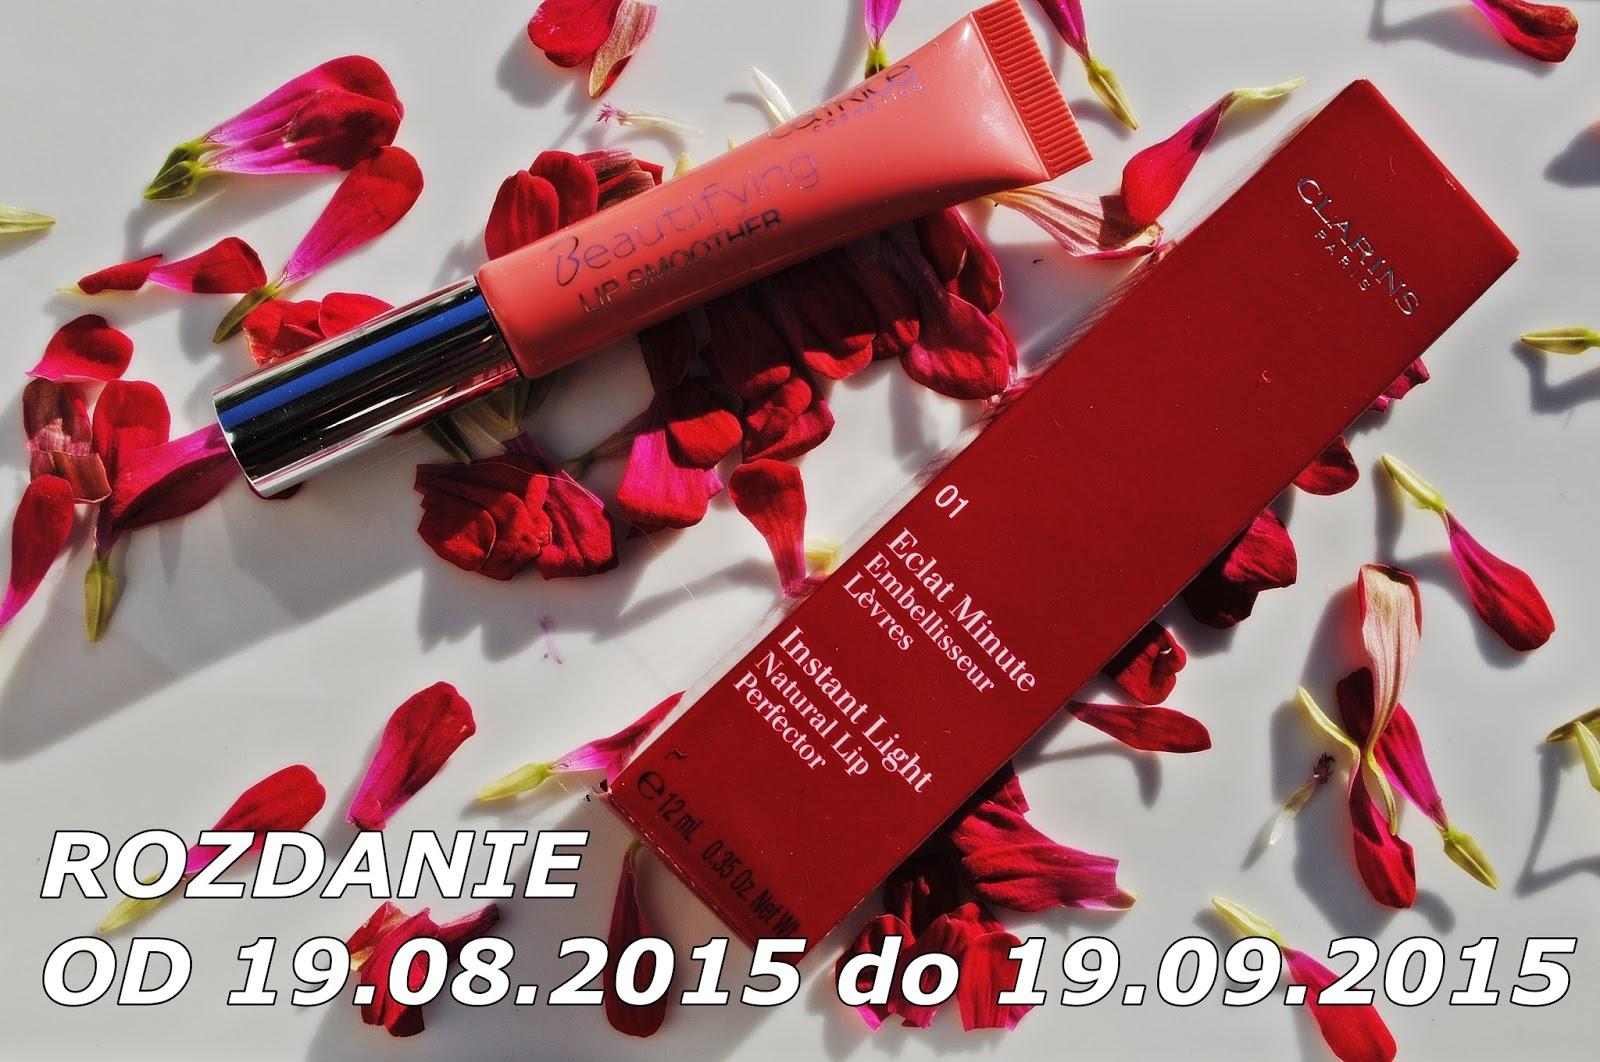 http://beautypediapatt.blogspot.com/2015/08/rozdanie-clarins-oraz-catrice.html